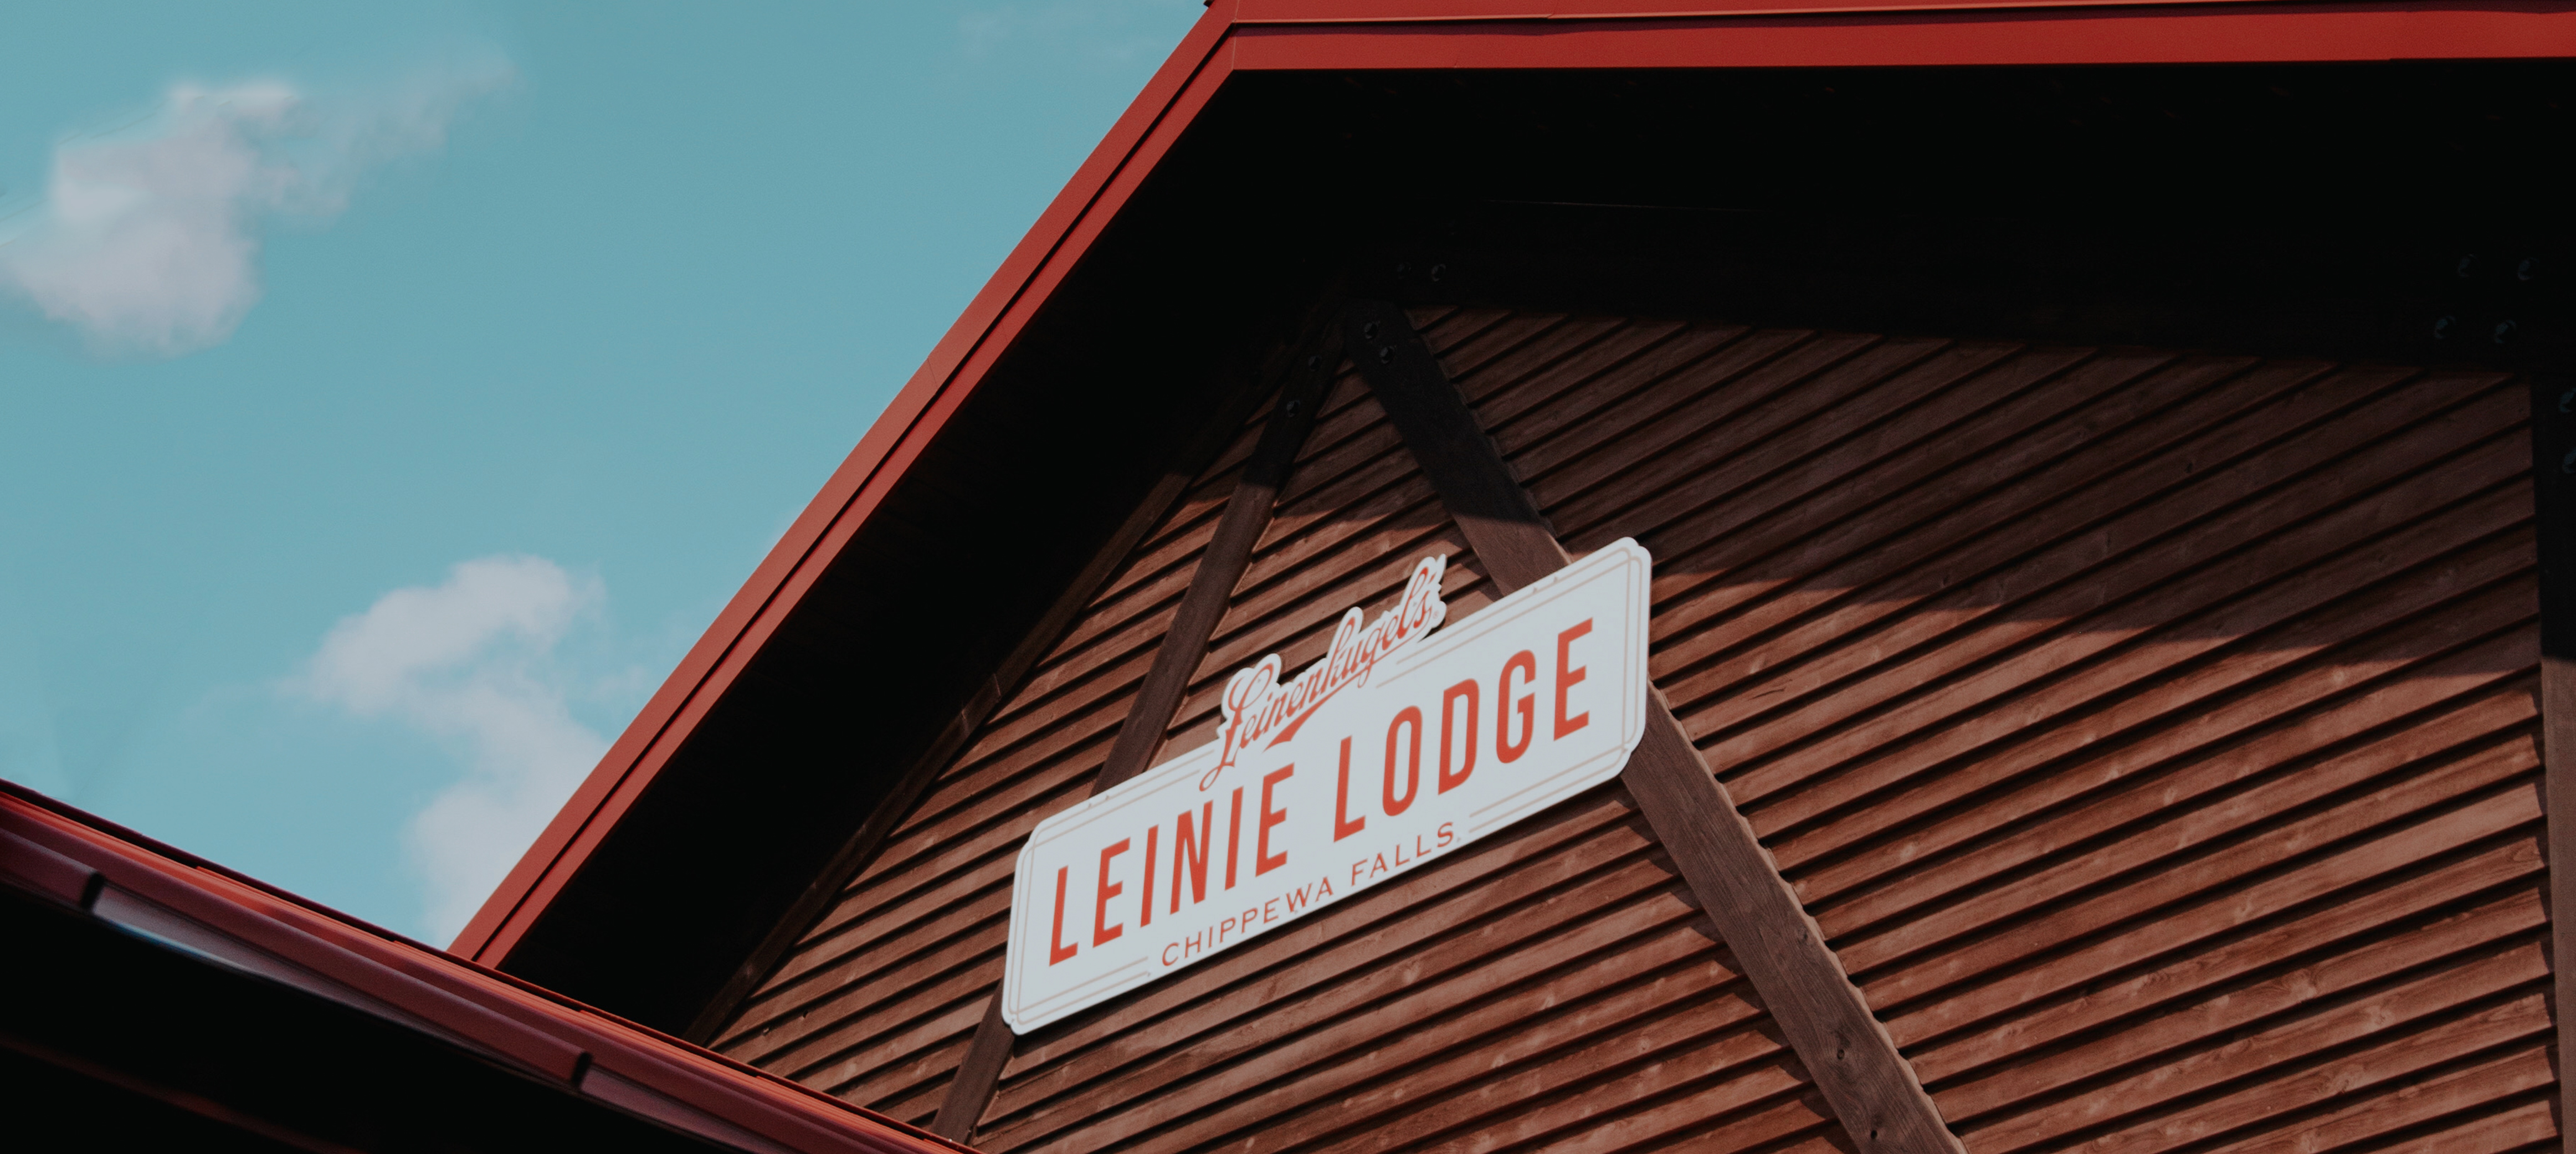 Leinenkugel's Leinie Lodge in Chippewa Falls, WI